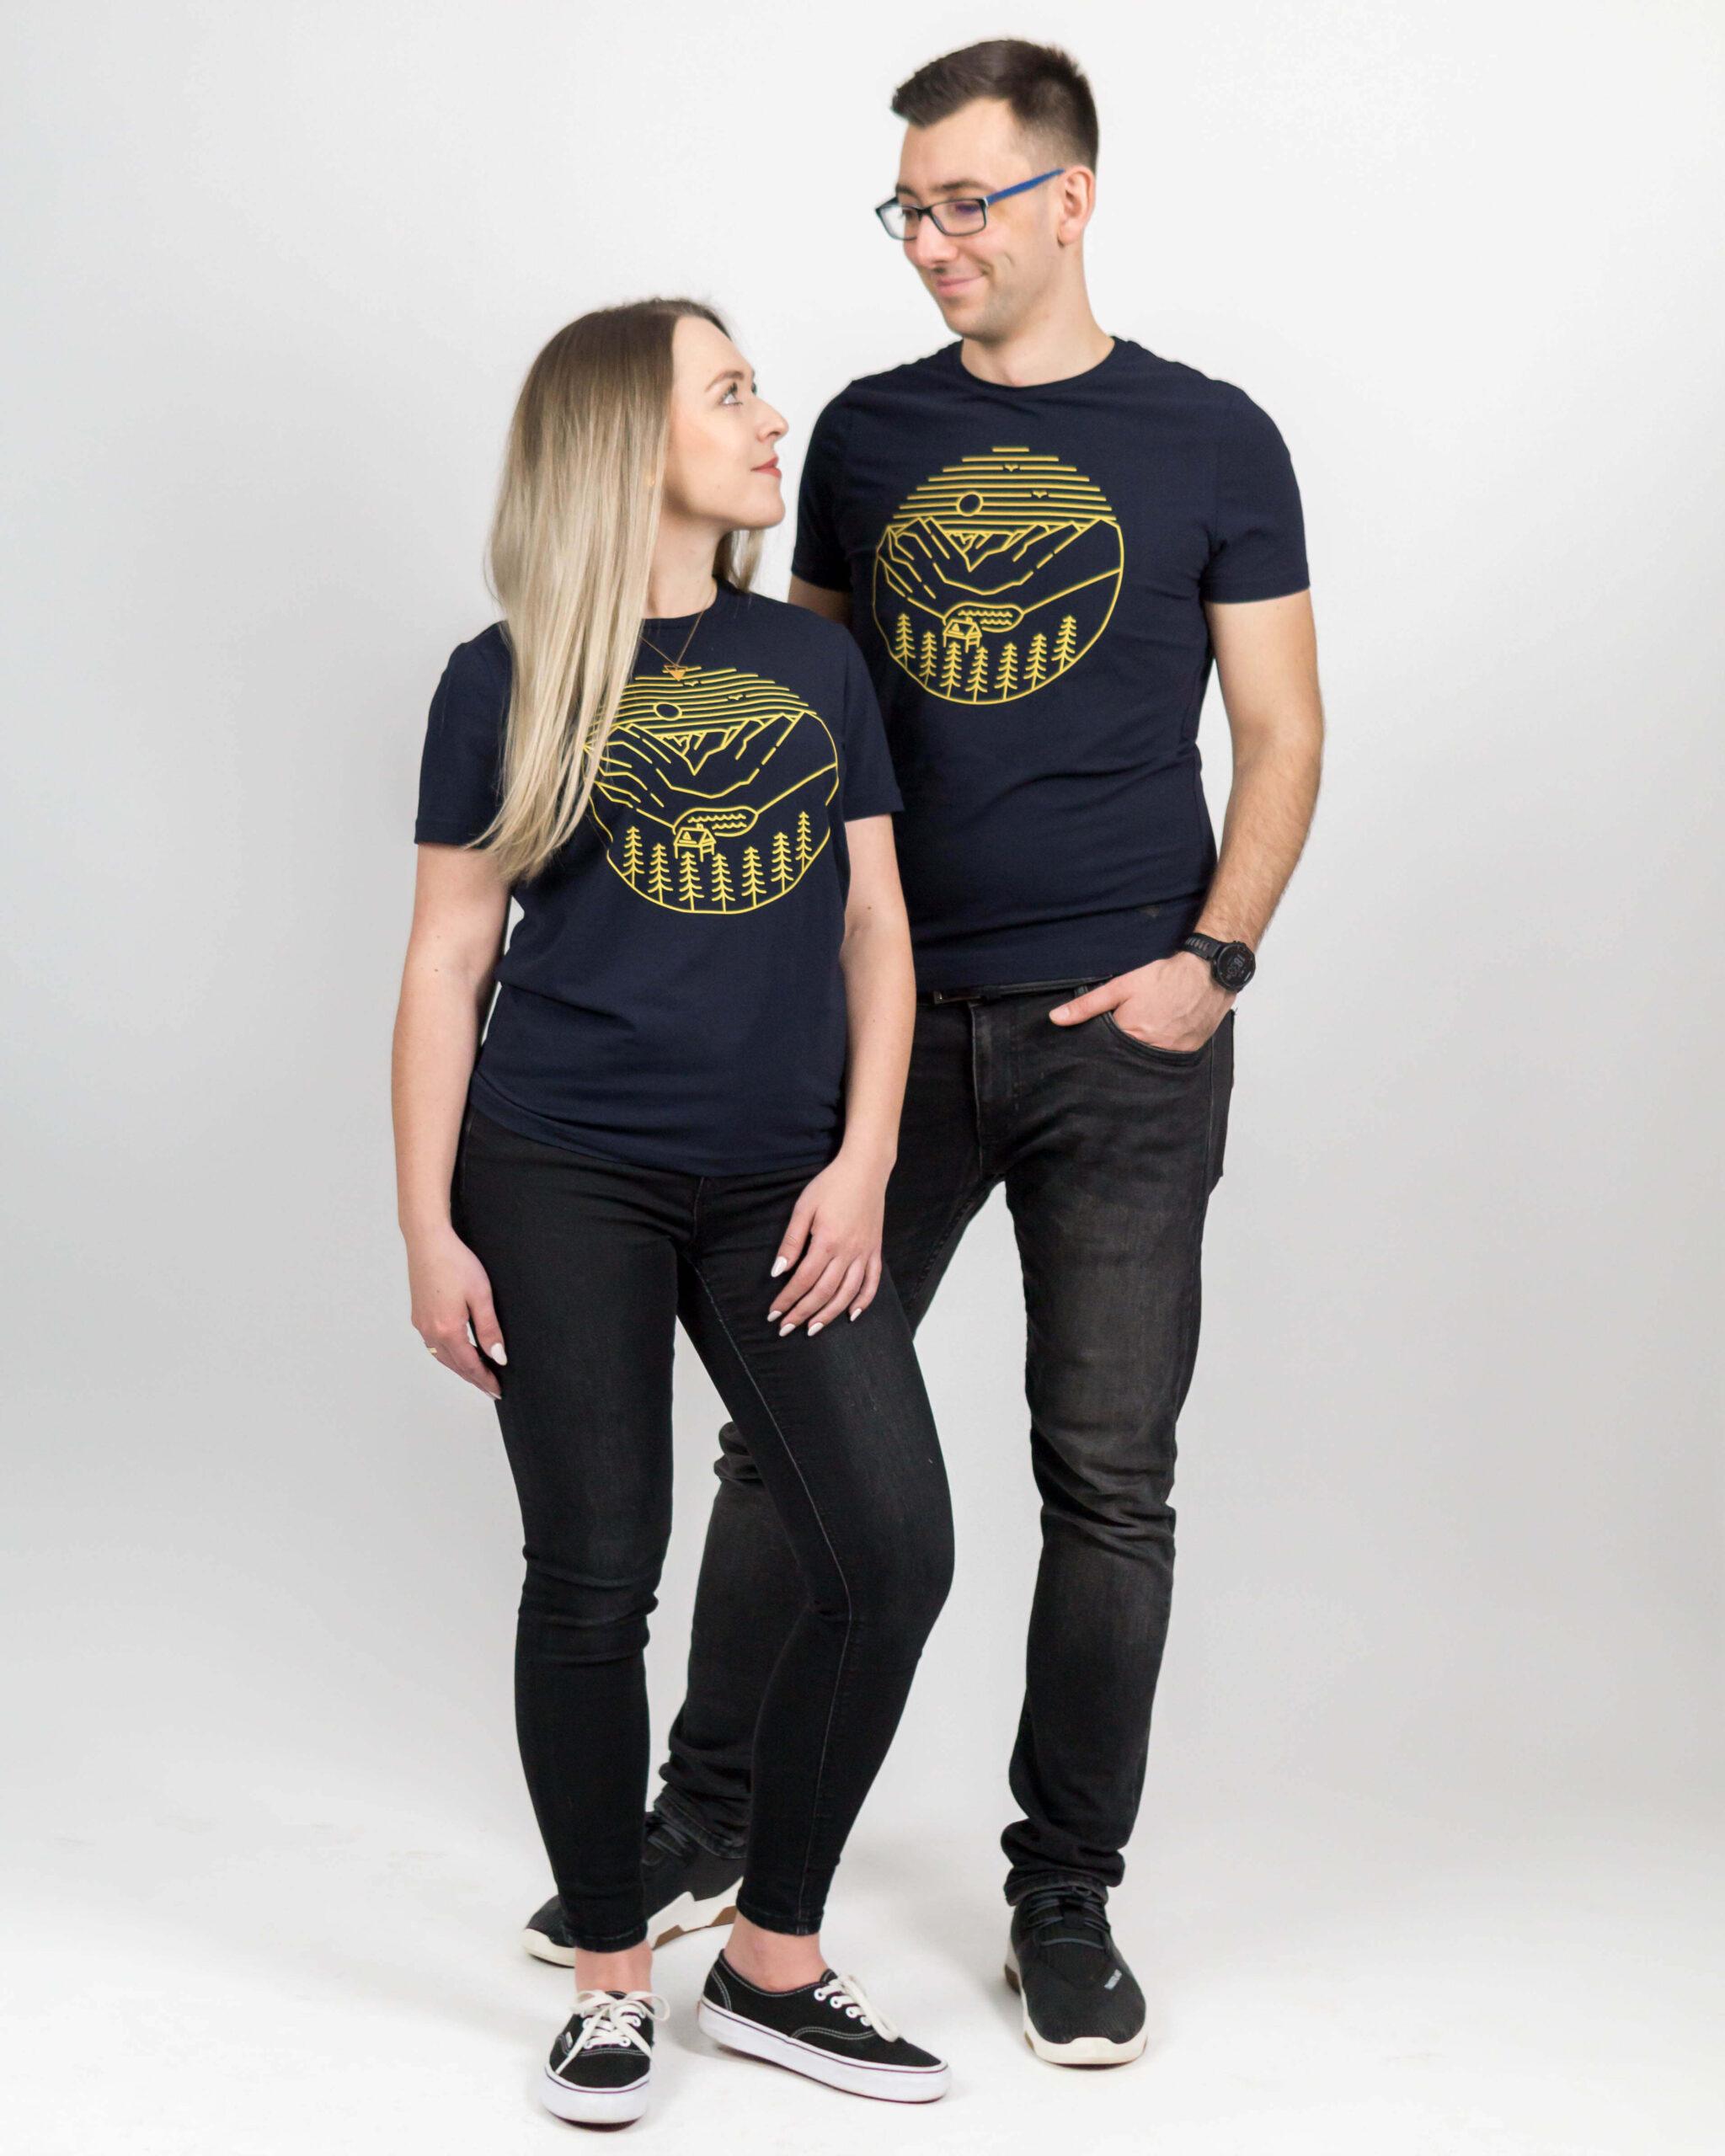 Koszulka Morskie Oko - para